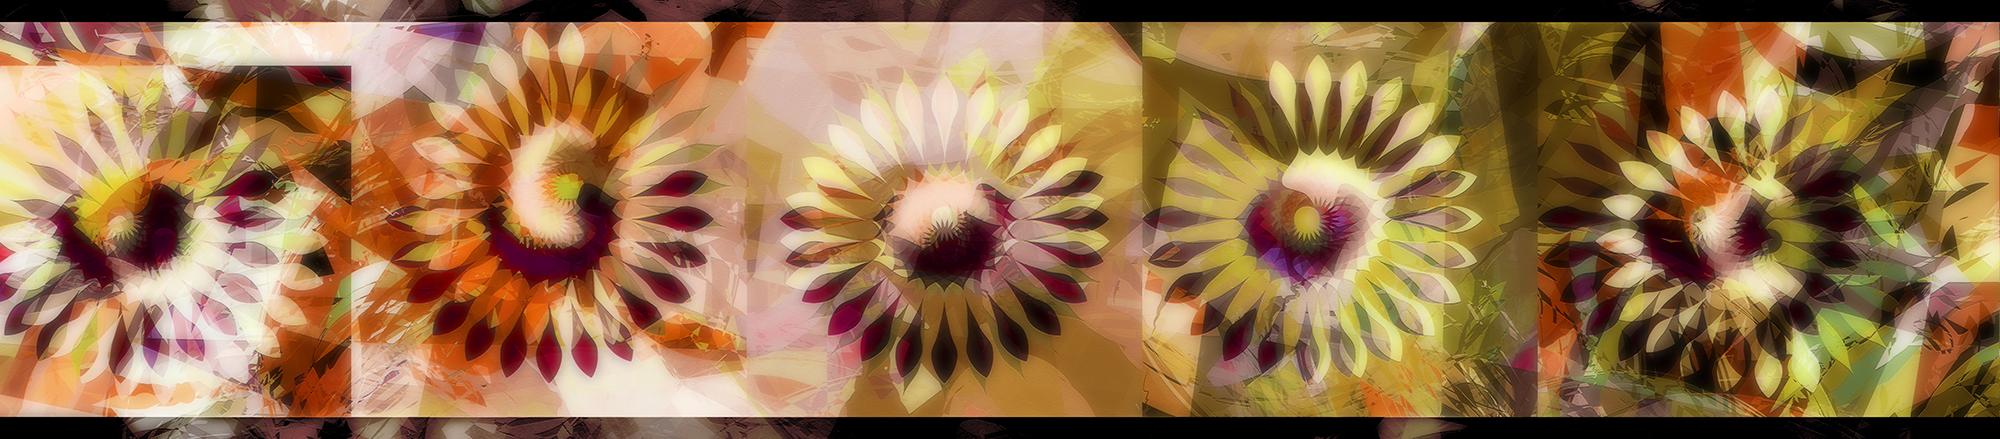 190314 Sun Flower 1